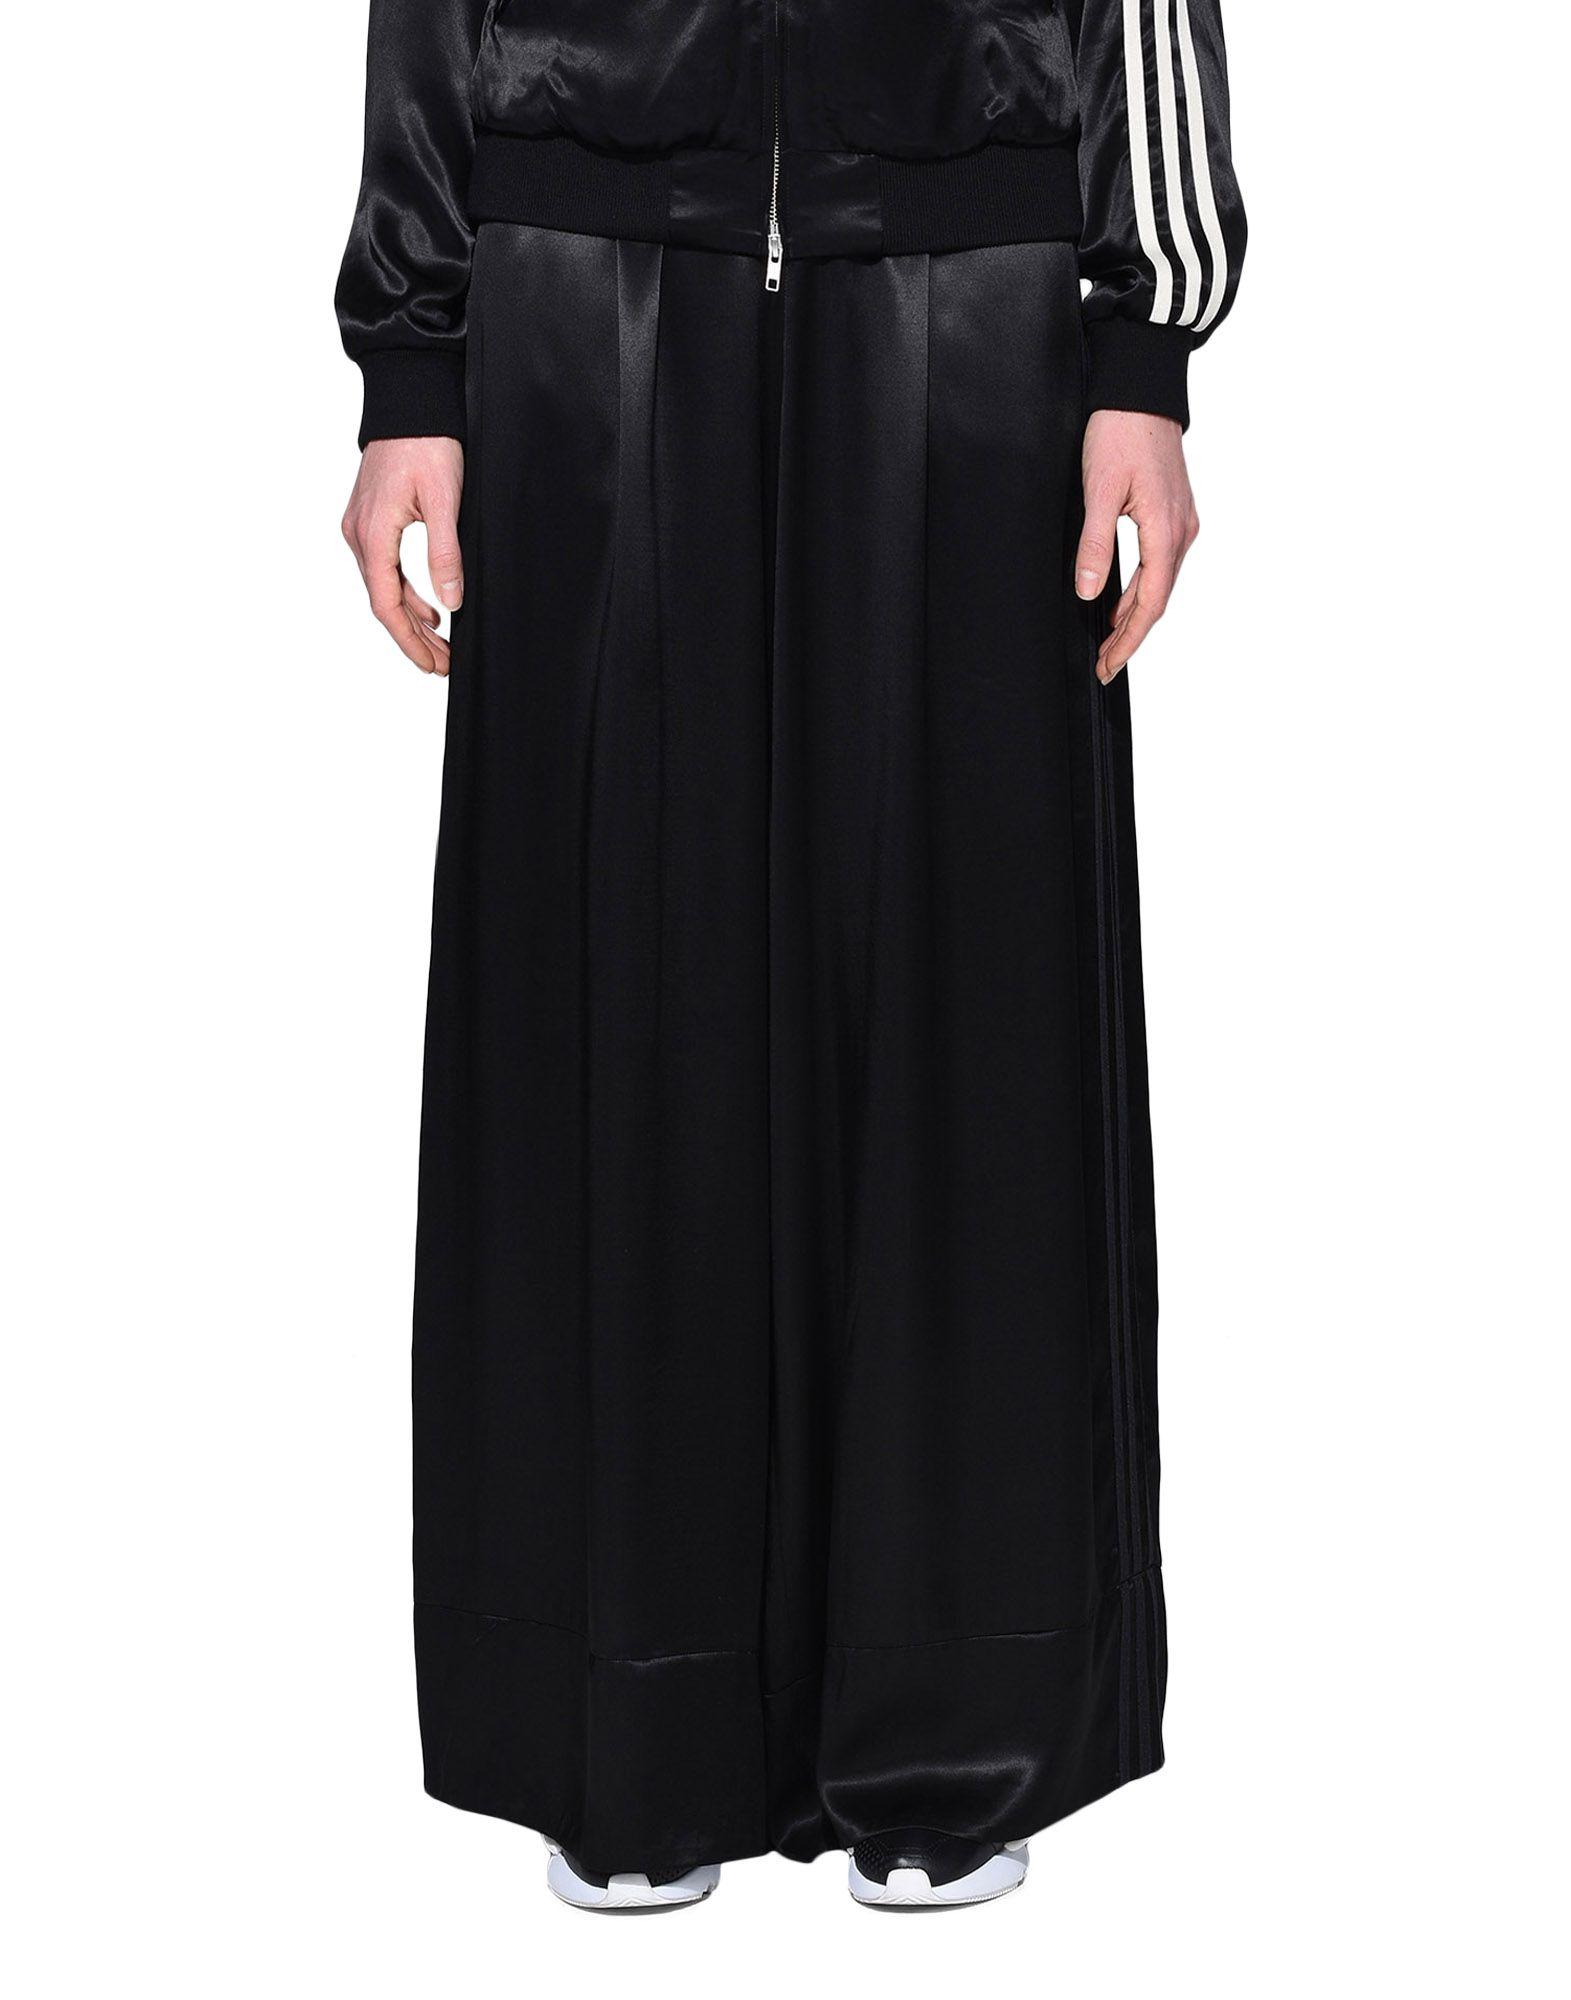 Y-3 Y-3 3-Stripes Lux Wide Track Pants Casual pants Woman r